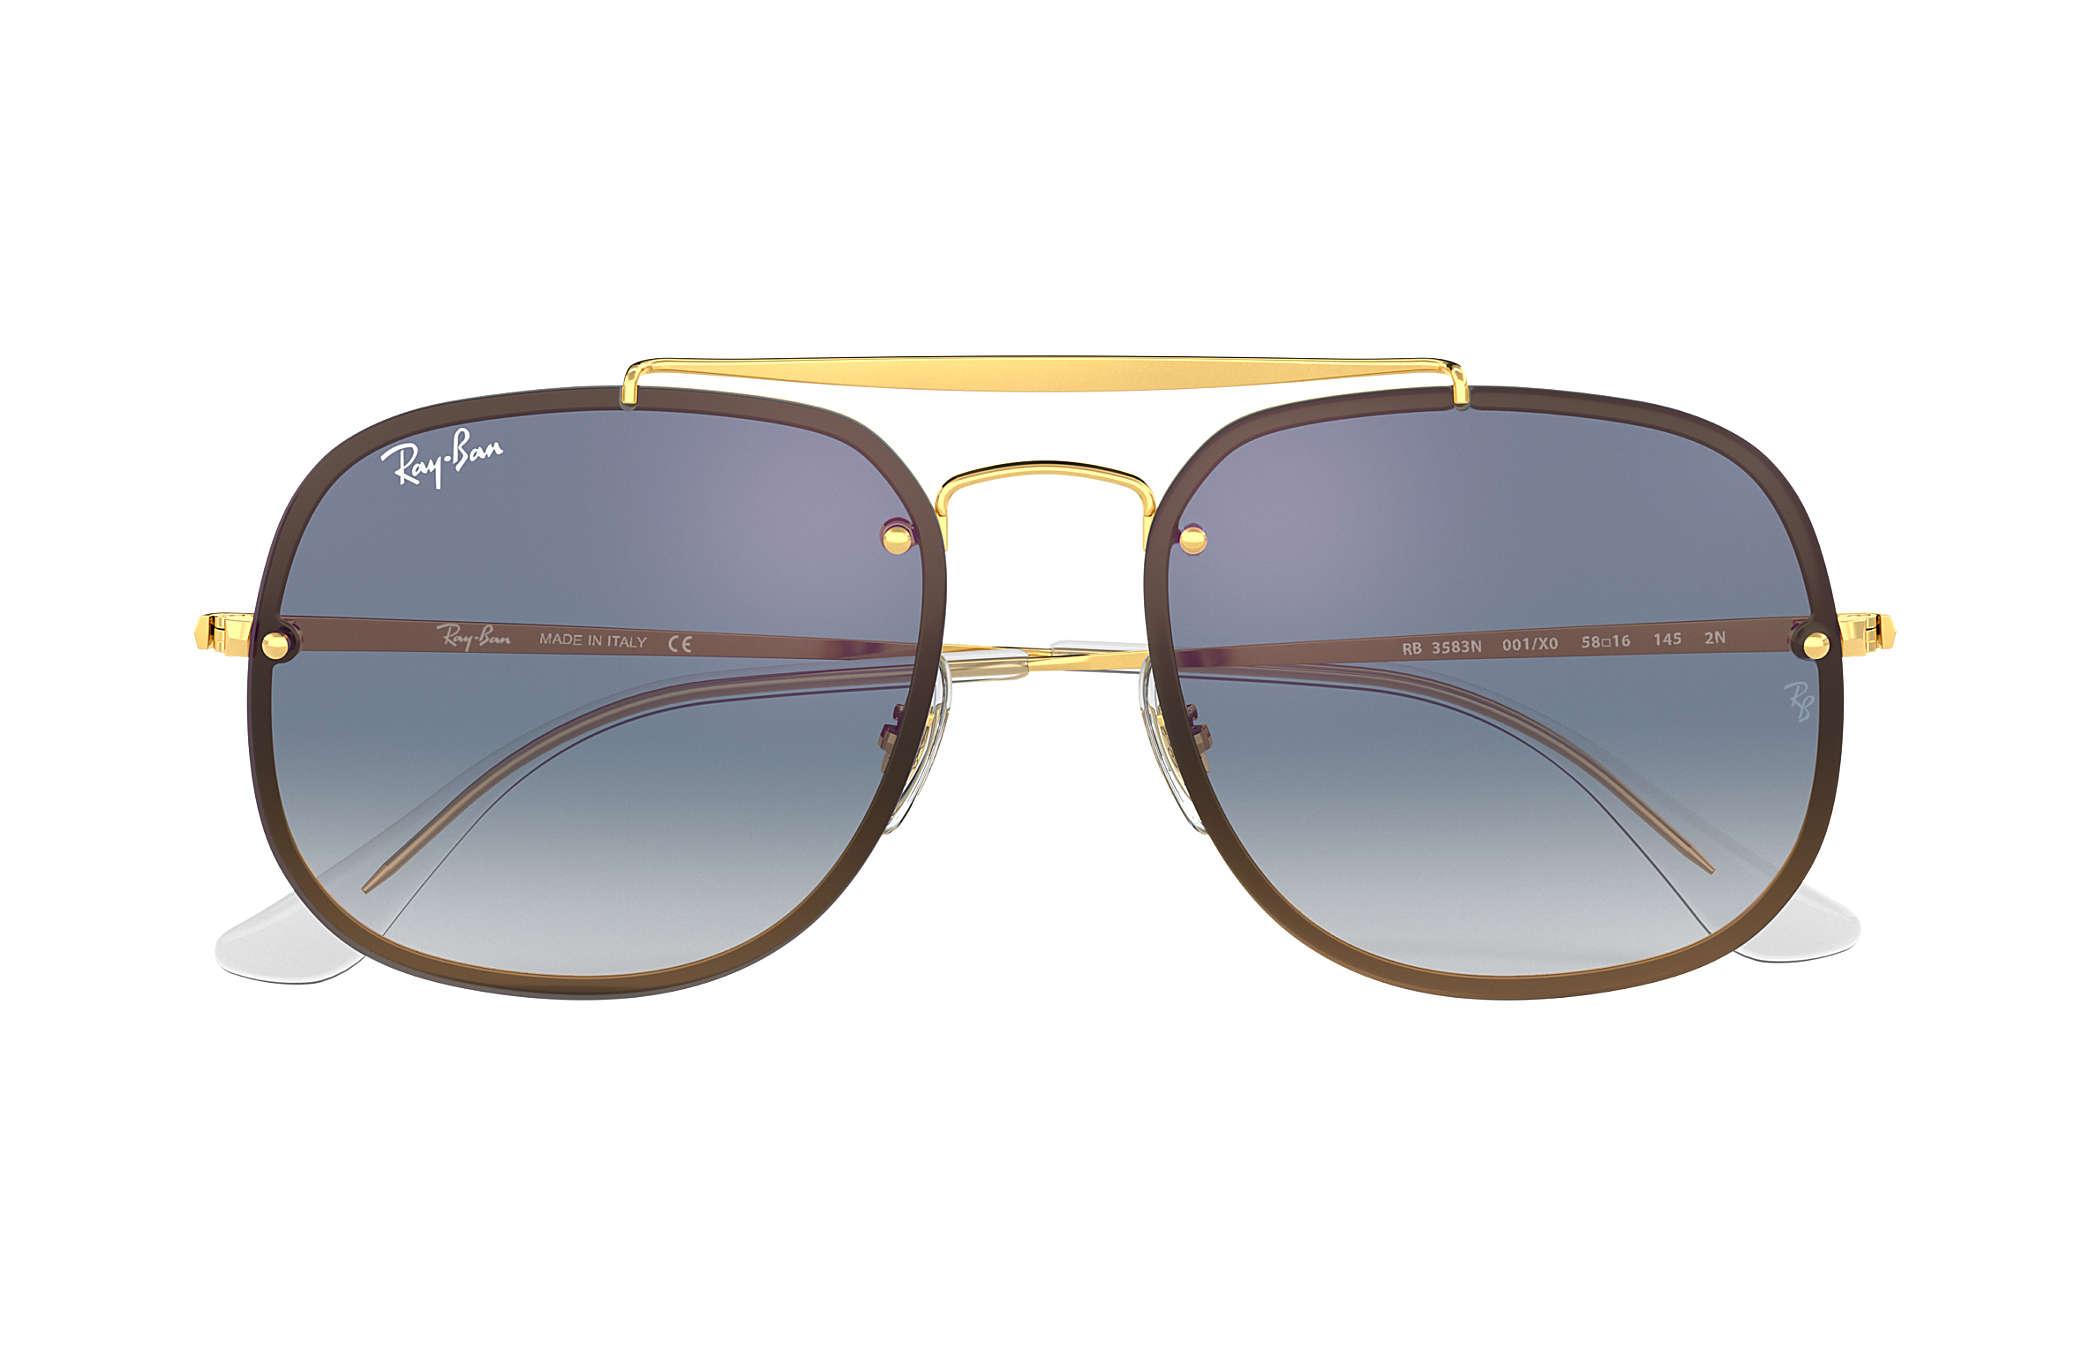 7c0f6441f7 Ray-Ban Blaze General RB3583N Gold - Steel - Blue Lenses ...